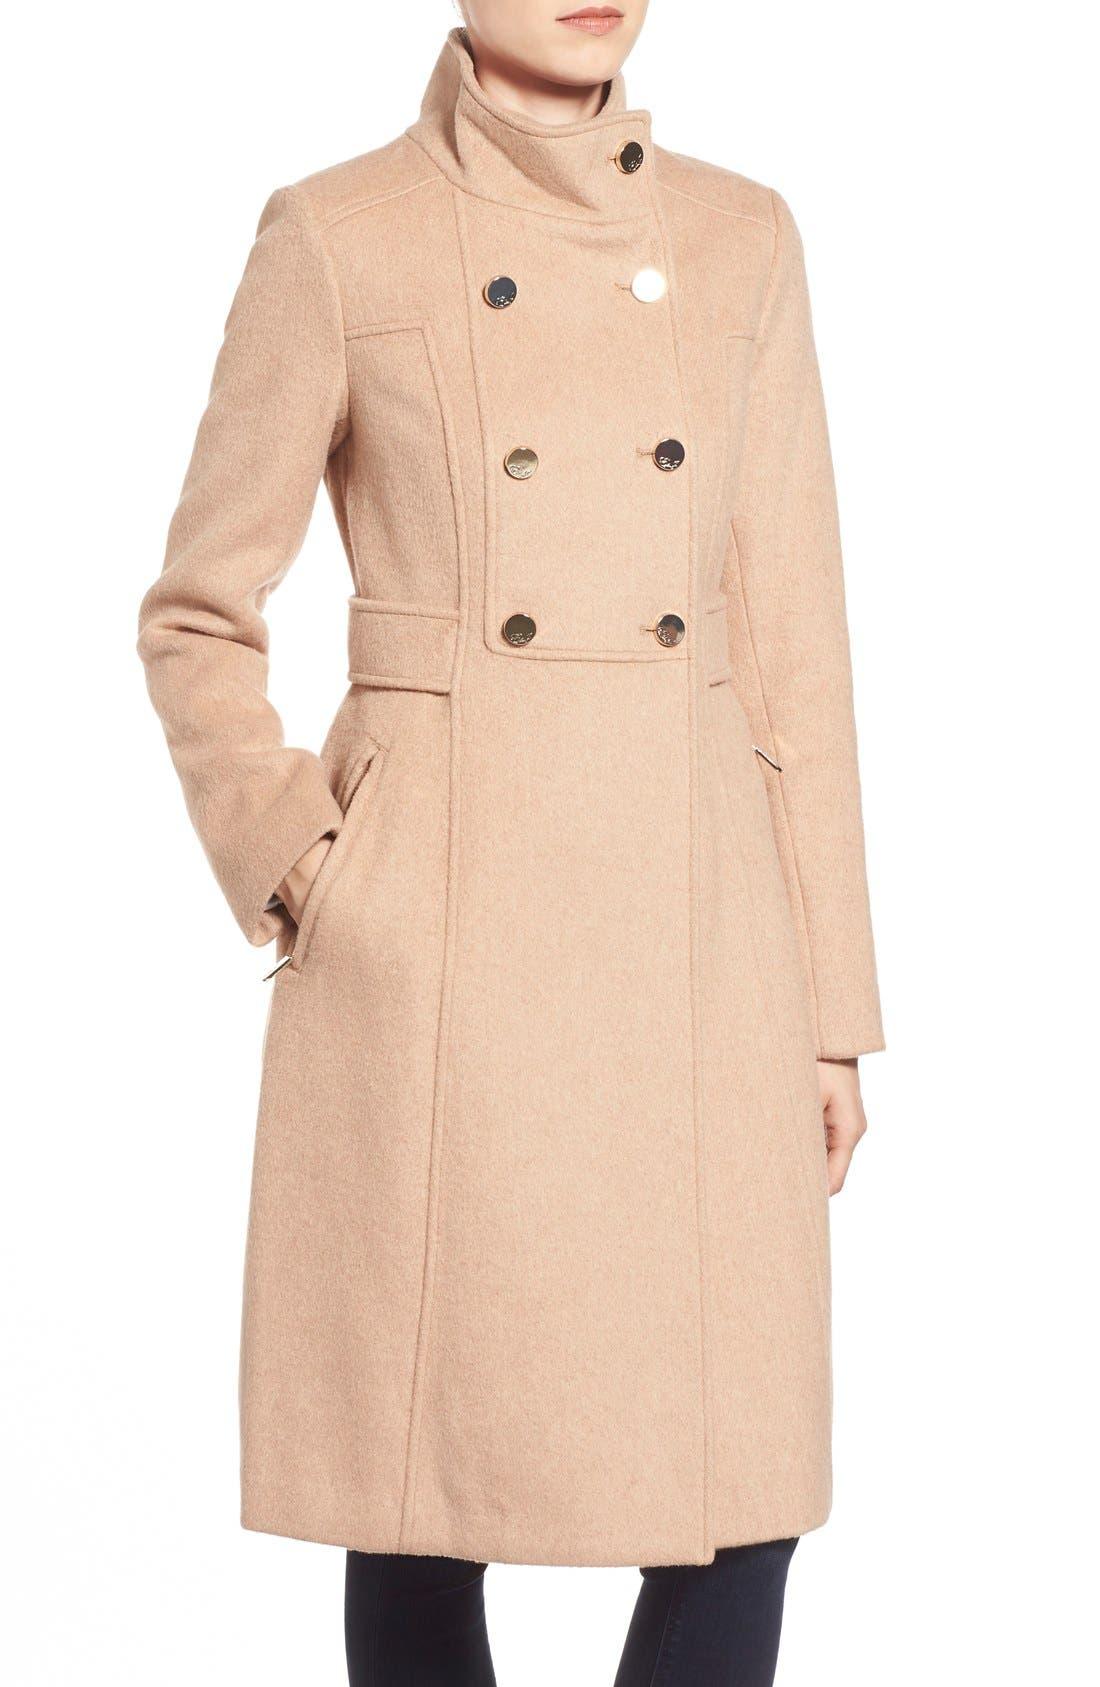 Wool Blend Long Military Coat,                             Alternate thumbnail 28, color,